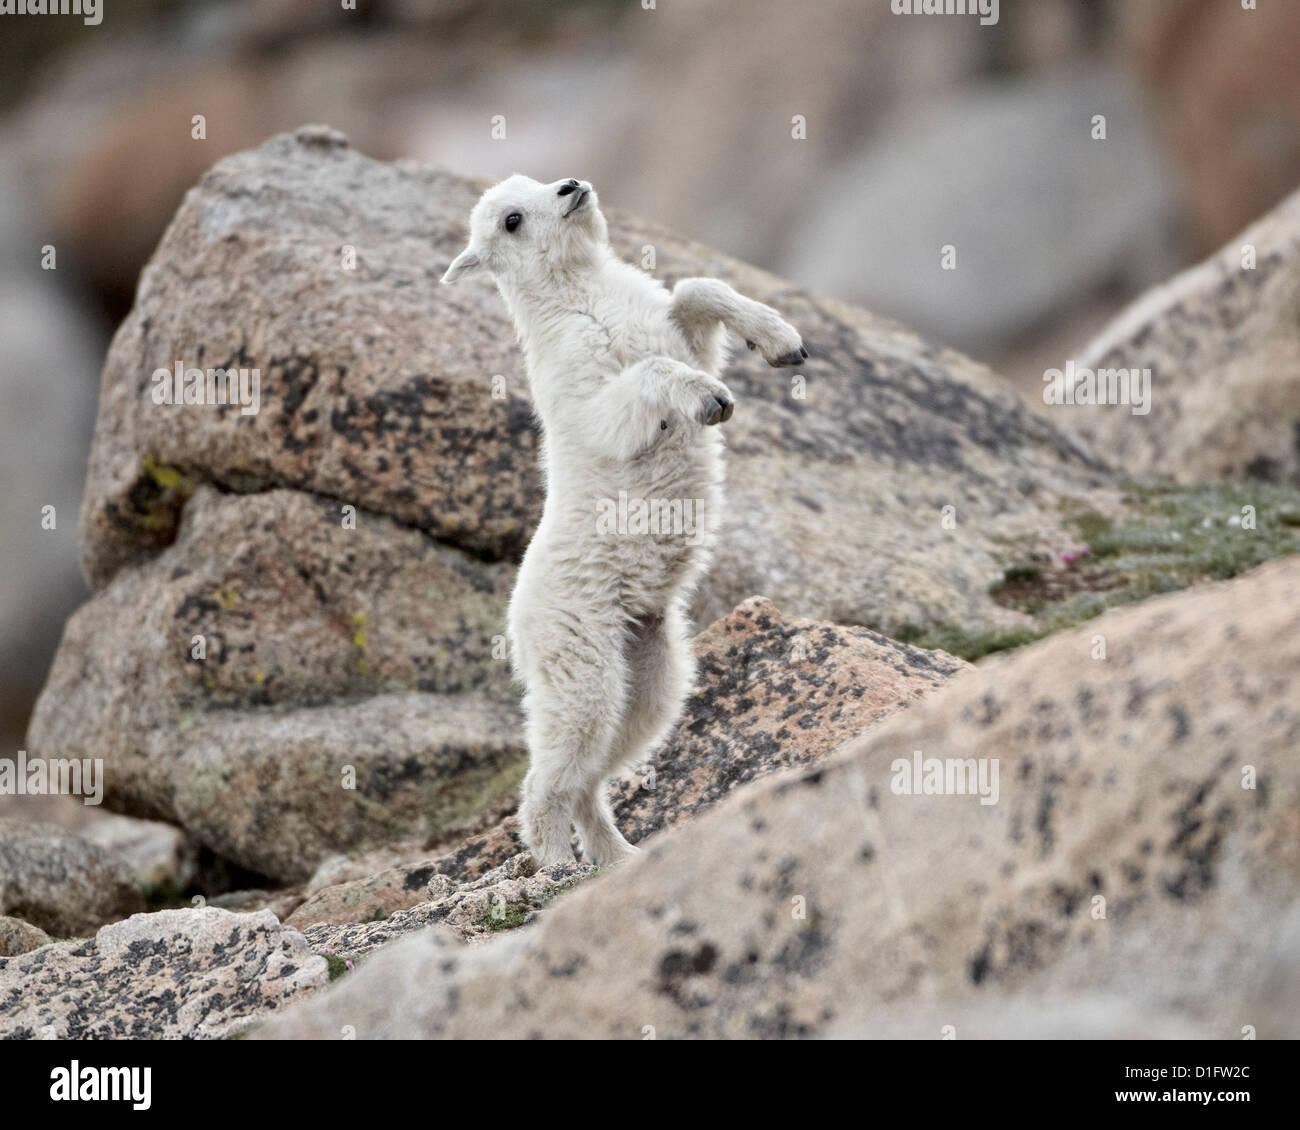 Mountain goat (Oreamnos americanus) kid jumping, Mount Evans, Arapaho-Roosevelt National Forest, Colorado, USA - Stock Image